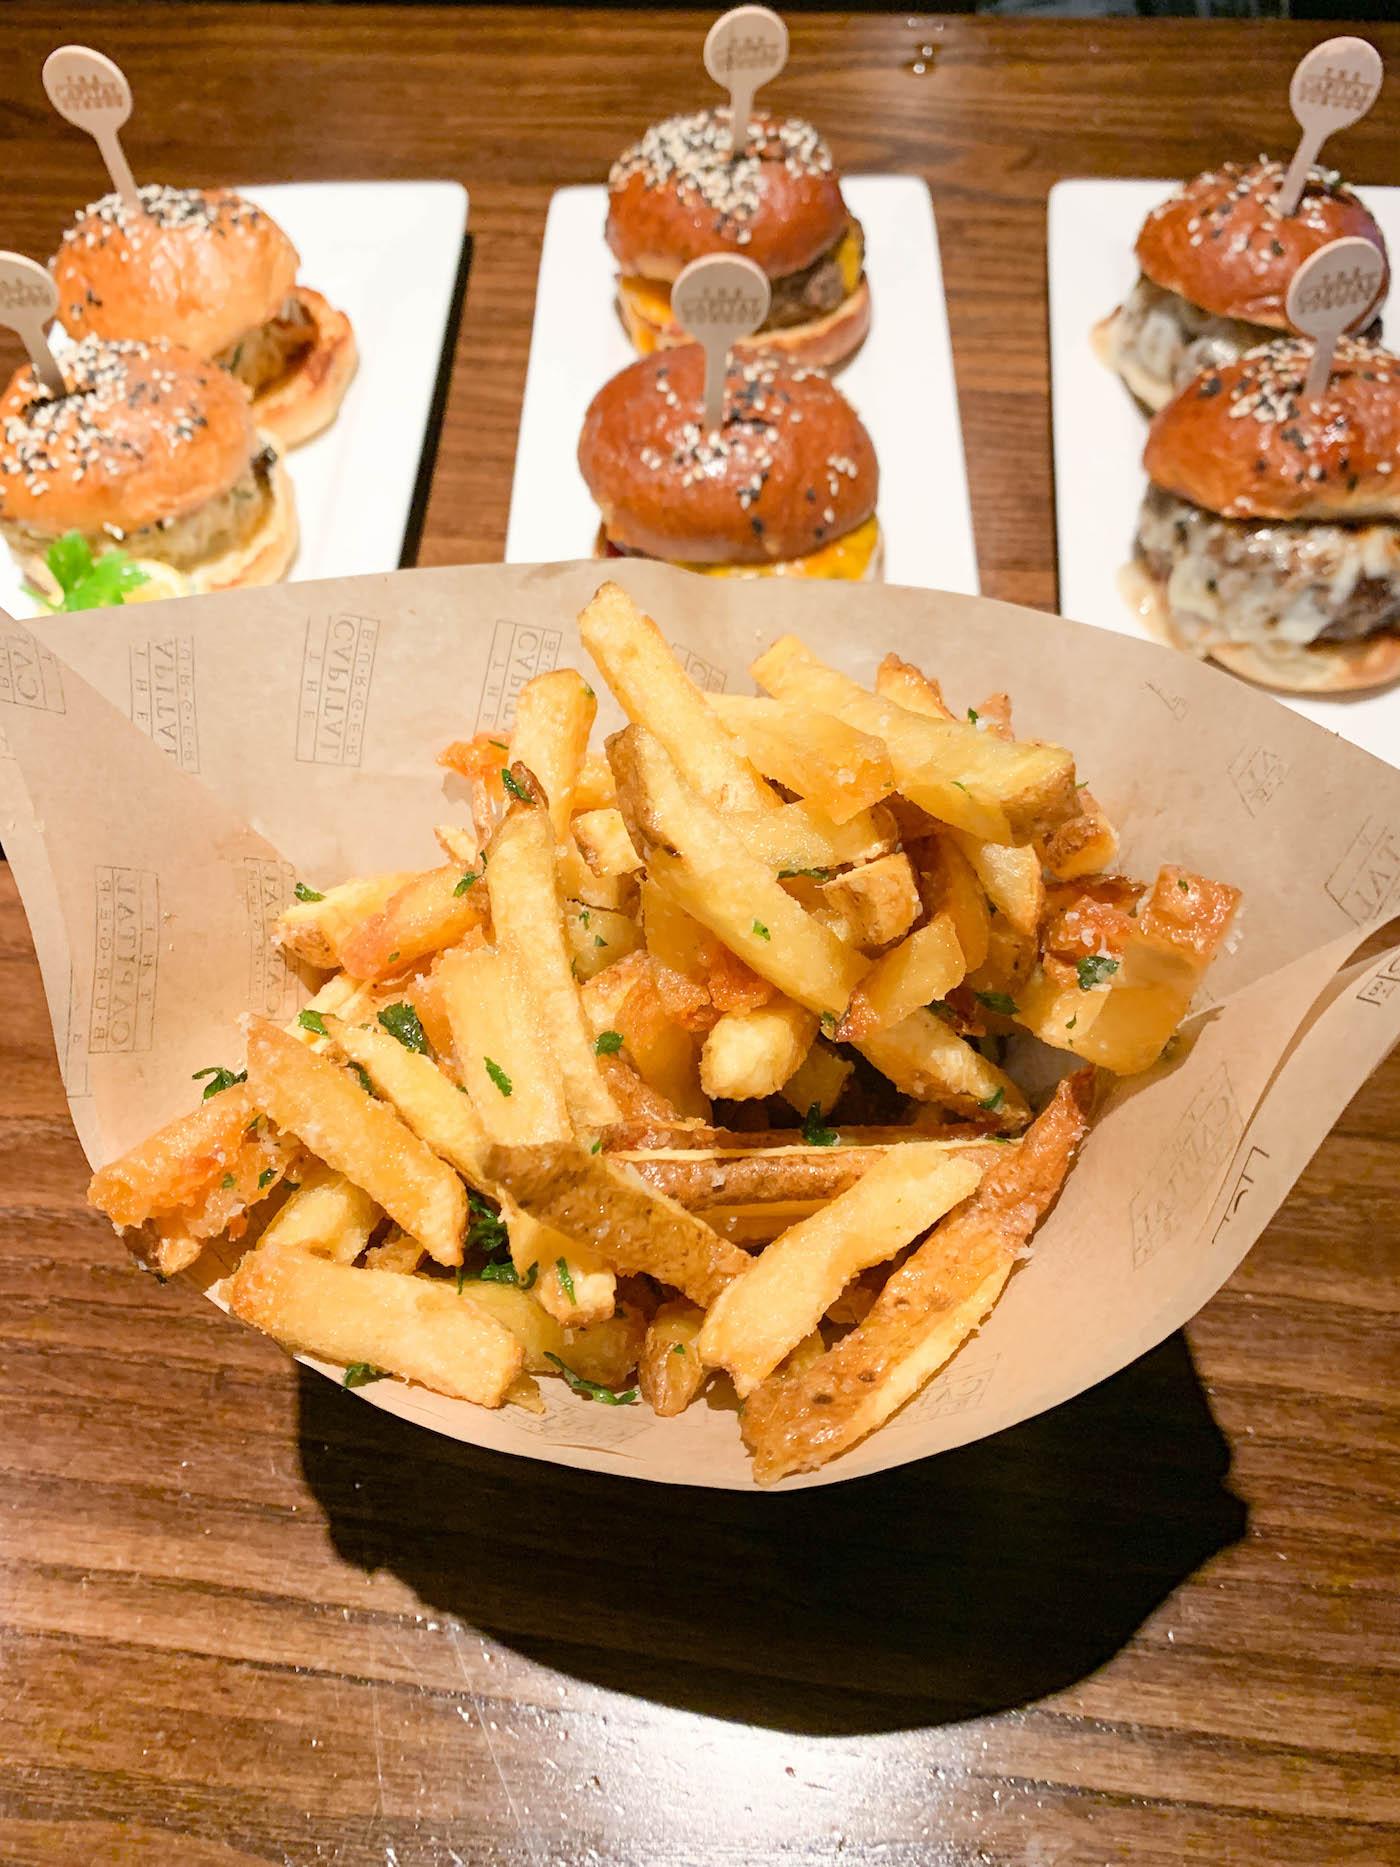 capital burger dc review